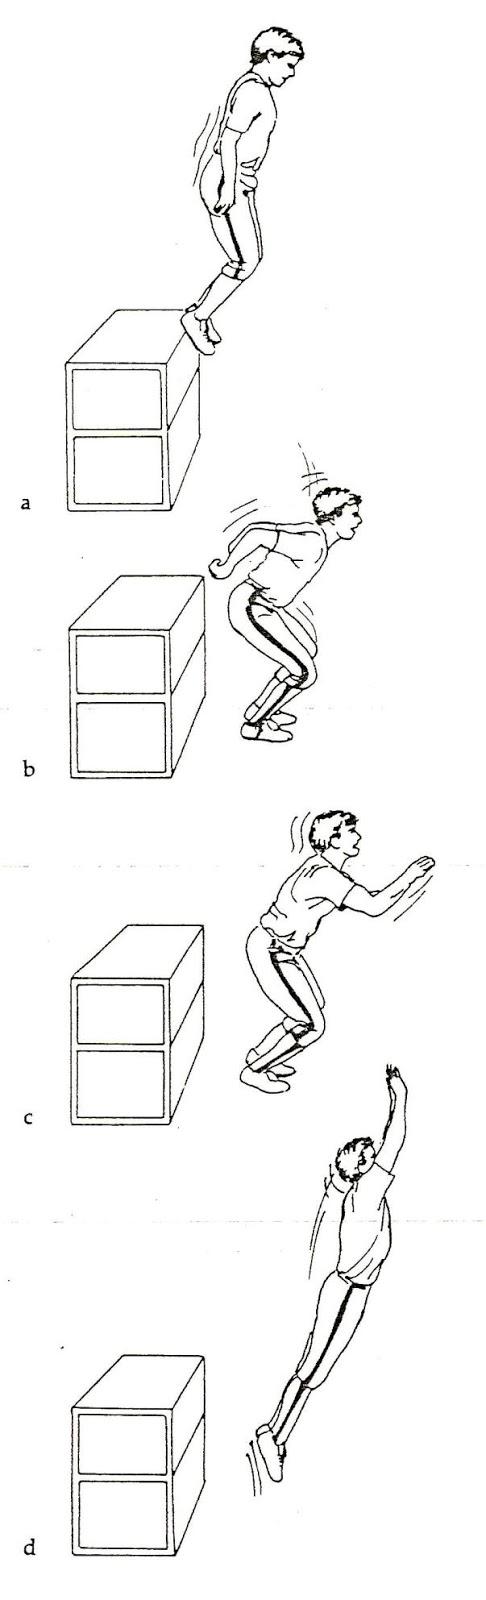 Cara Jumping Tinggi : jumping, tinggi, Menambah, Vertikal, Volly:, Volly